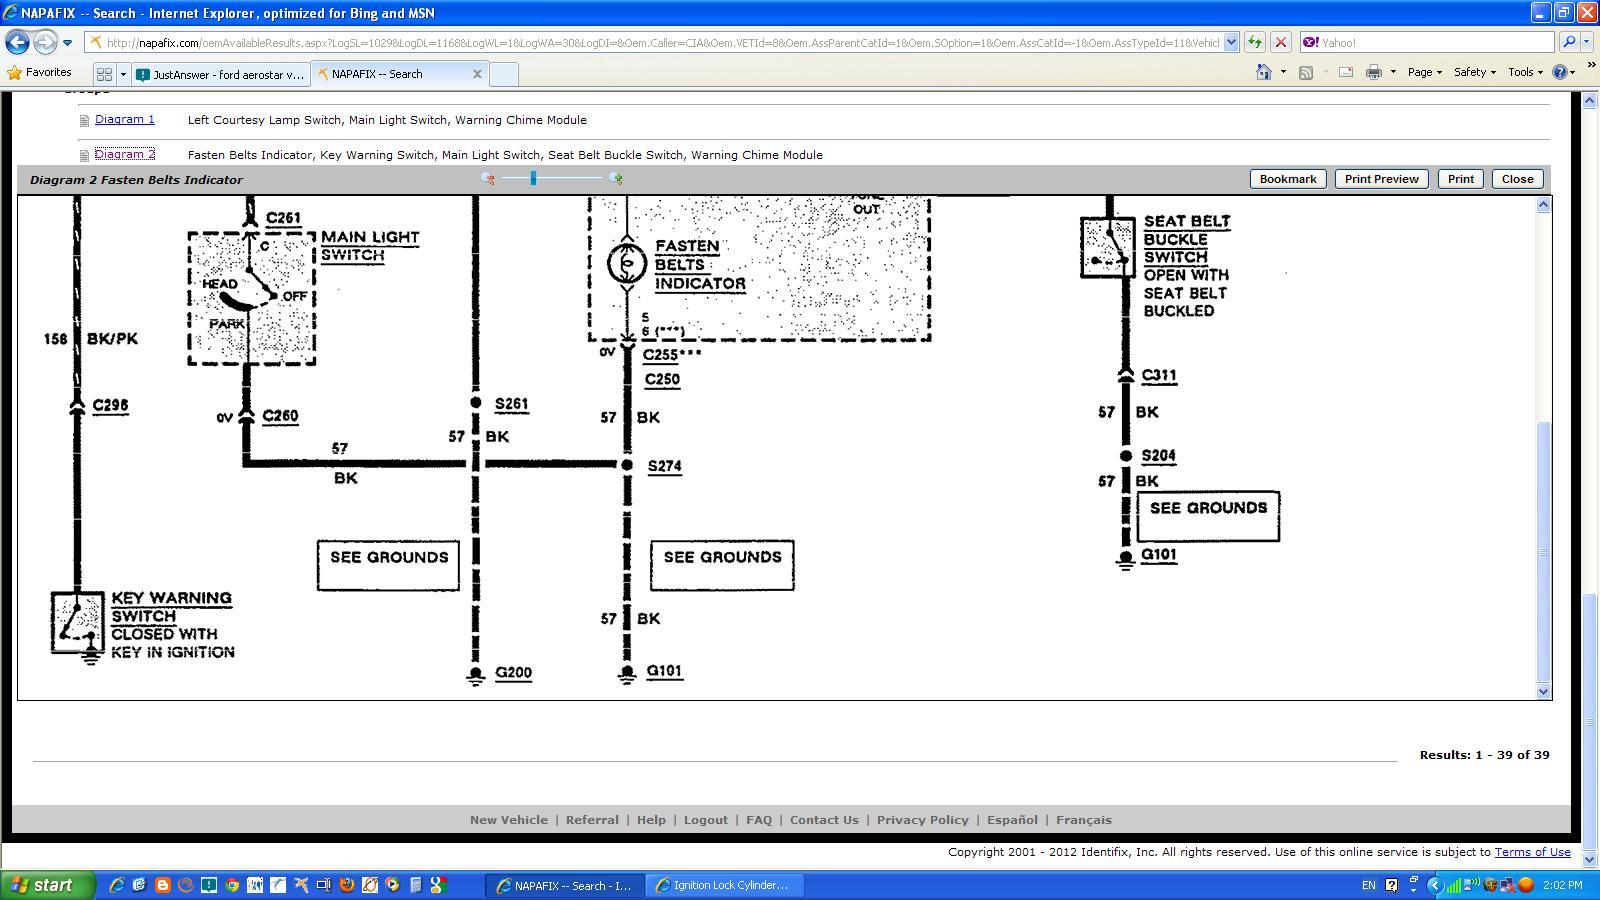 2012 03 10_190429_key_warning_switch light switch wiring diagram 2 8 on light switch wiring diagram 2